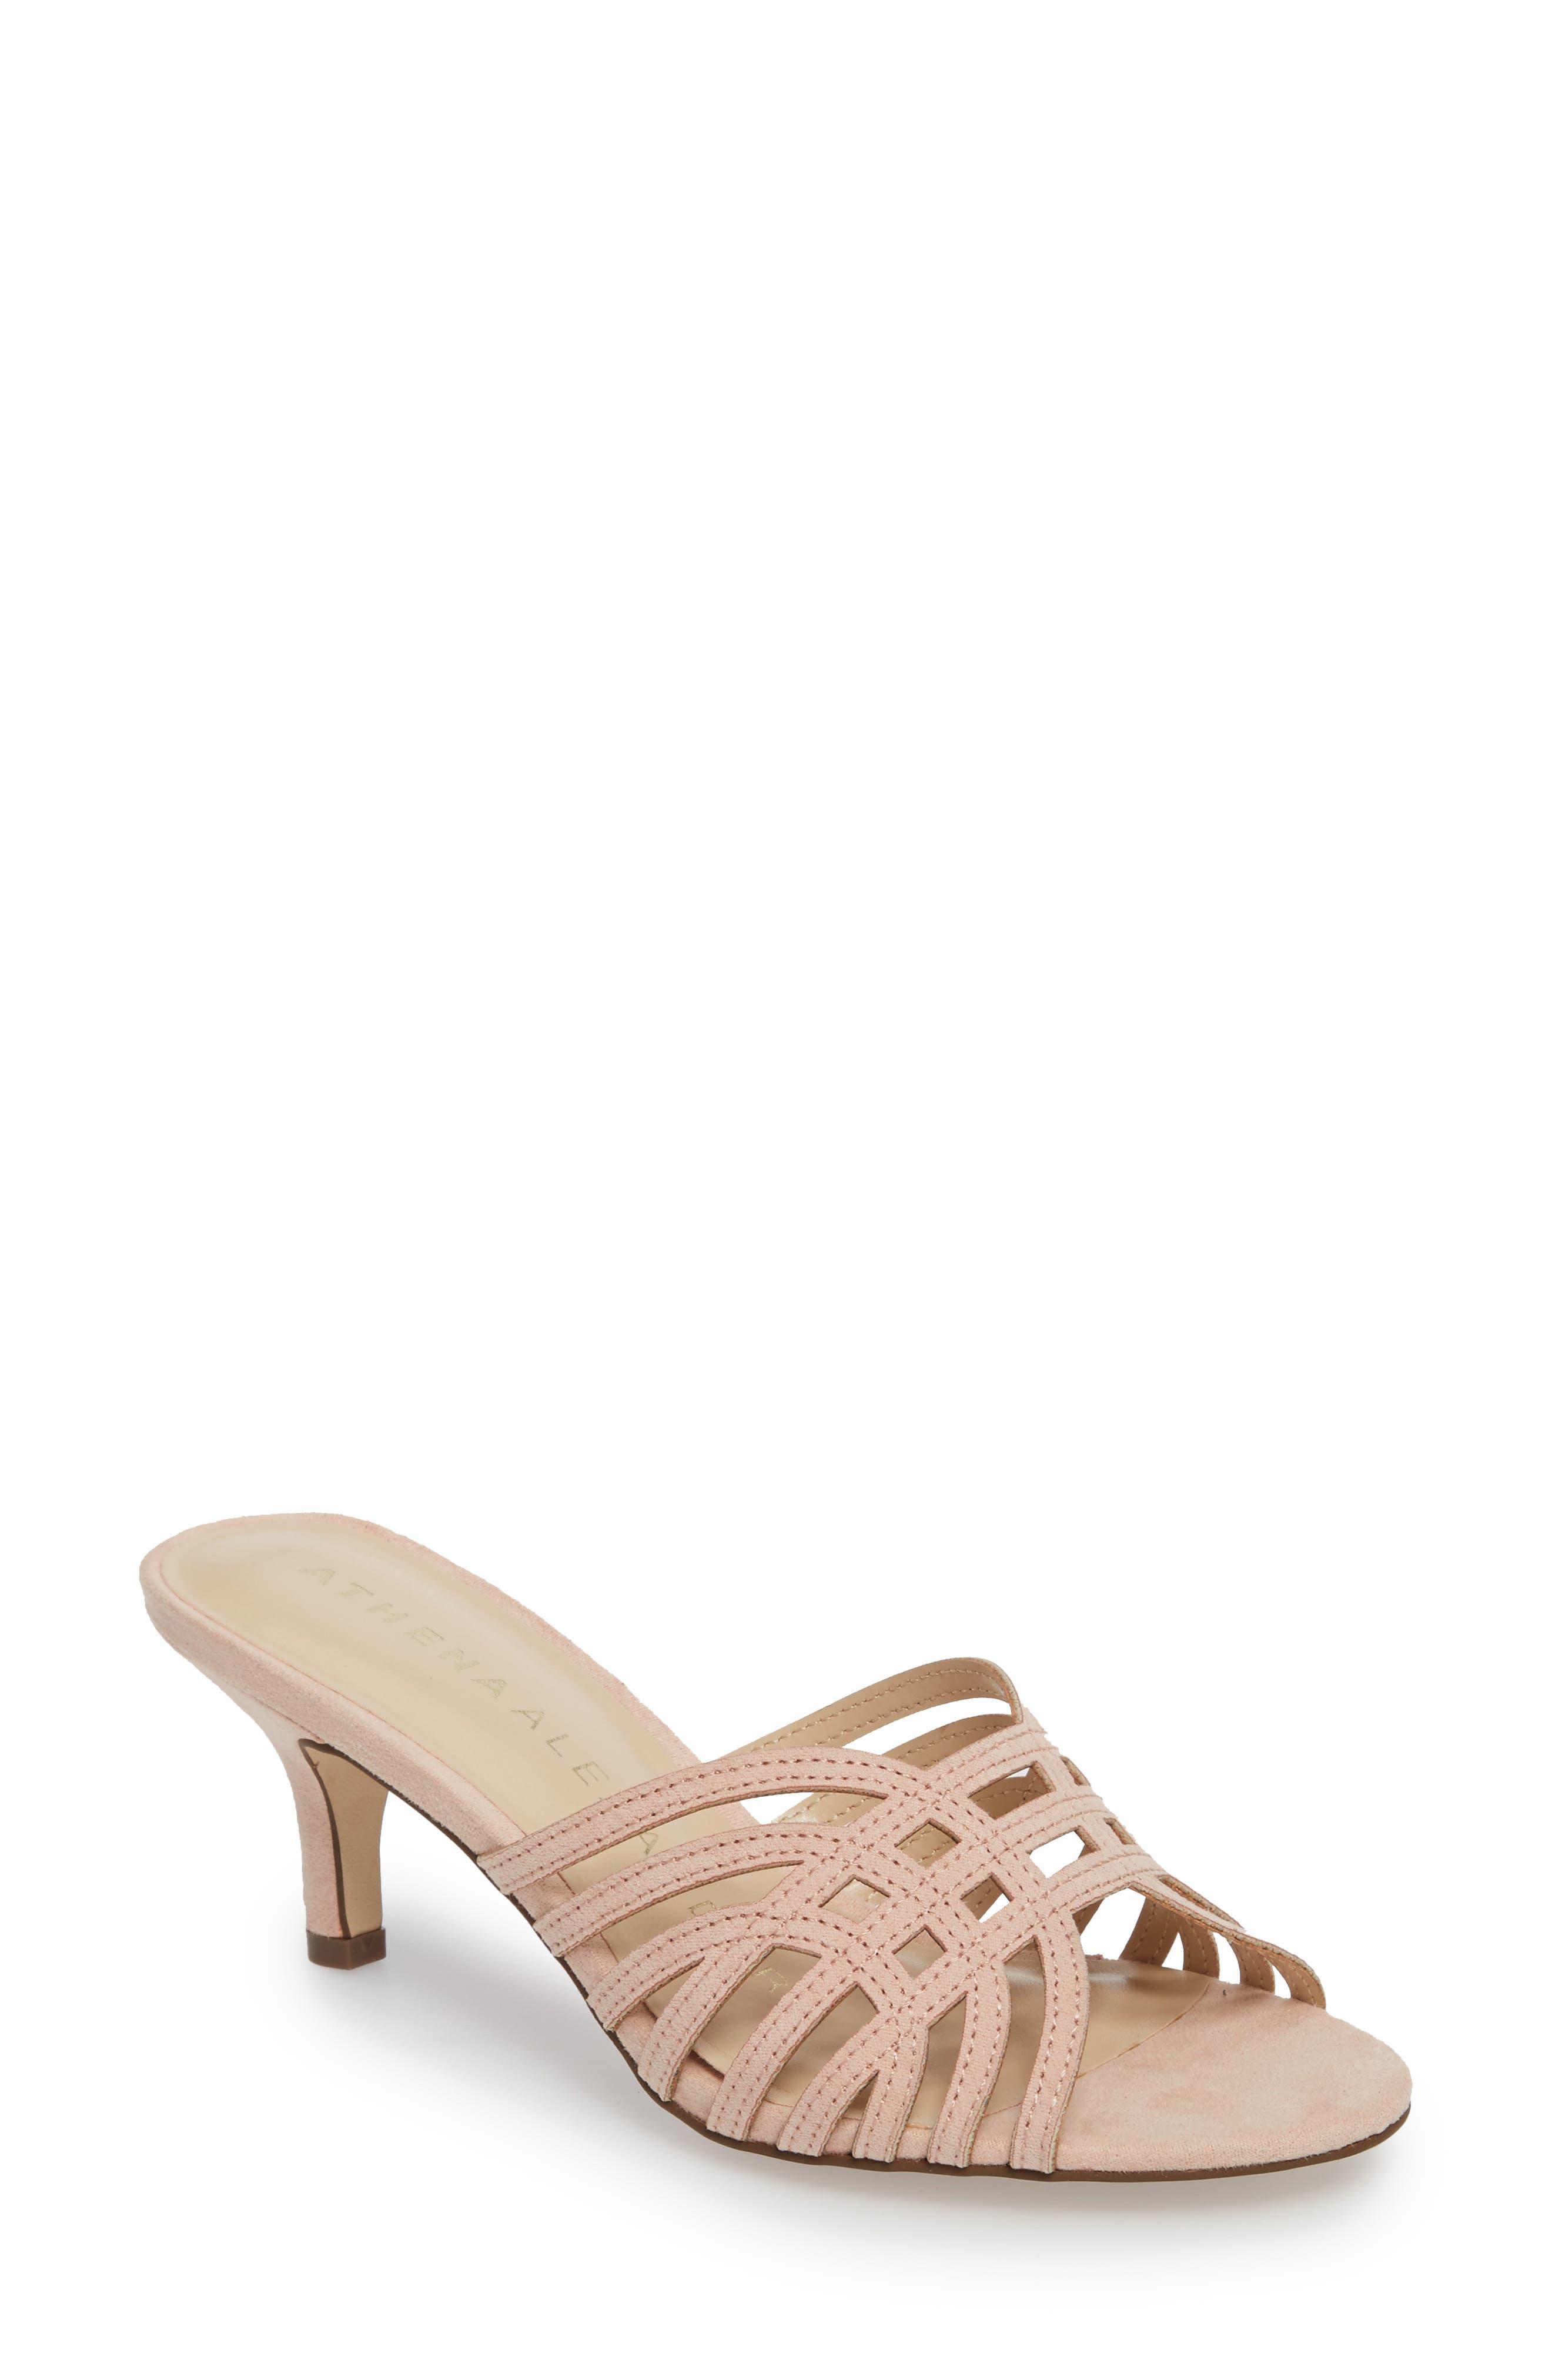 Athena Alexander Cece Cutout Sandal- Pink